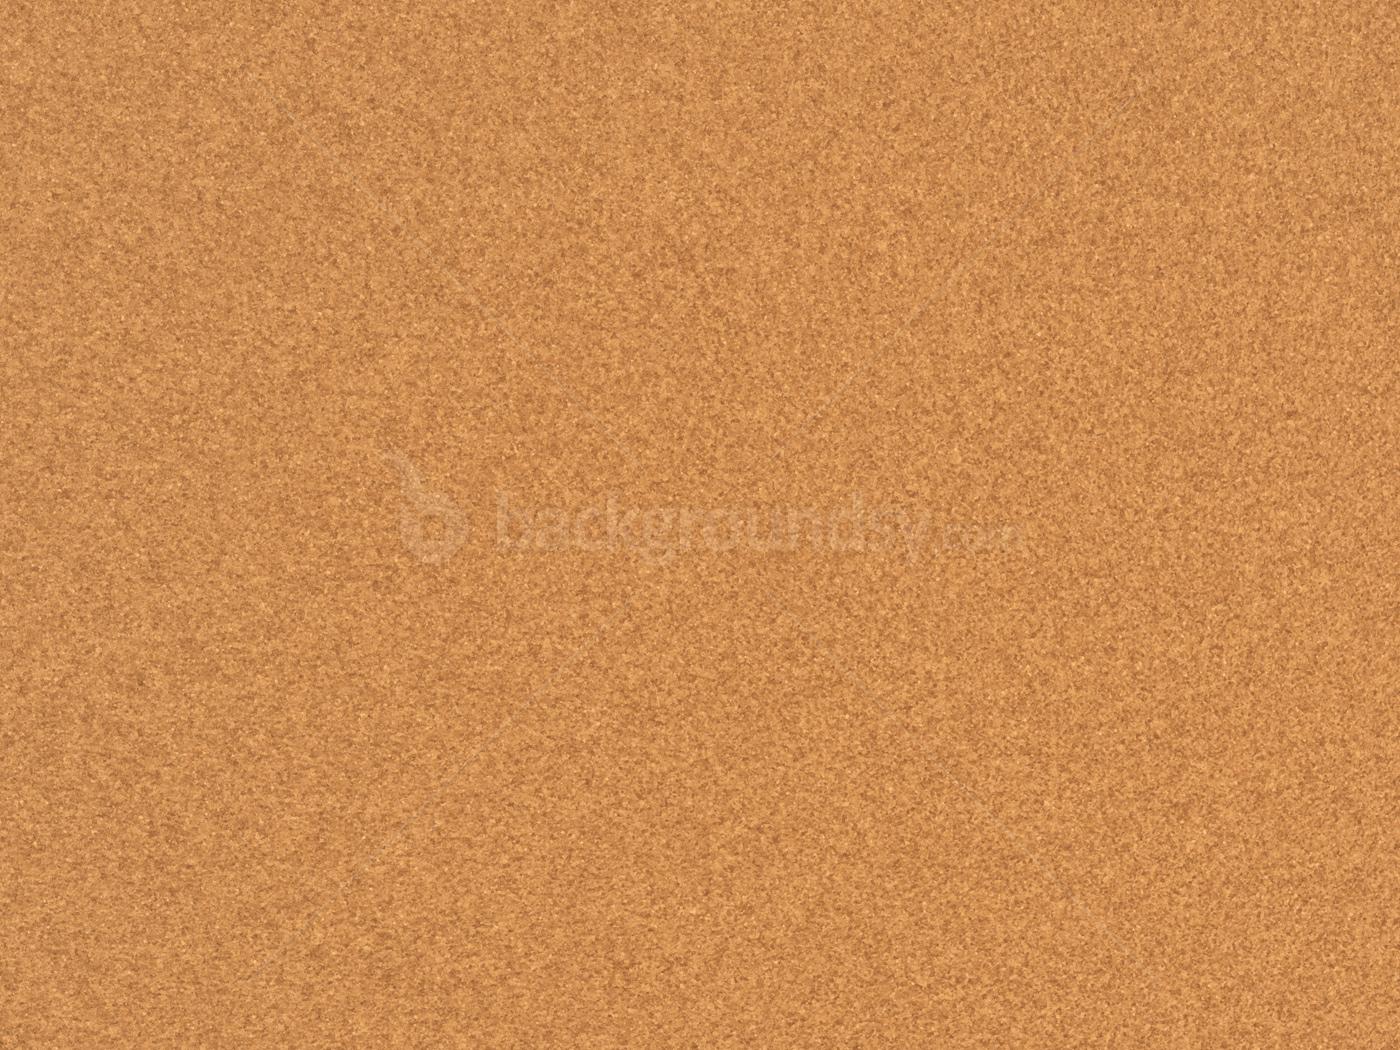 Cork texture   Backgroundsy.com